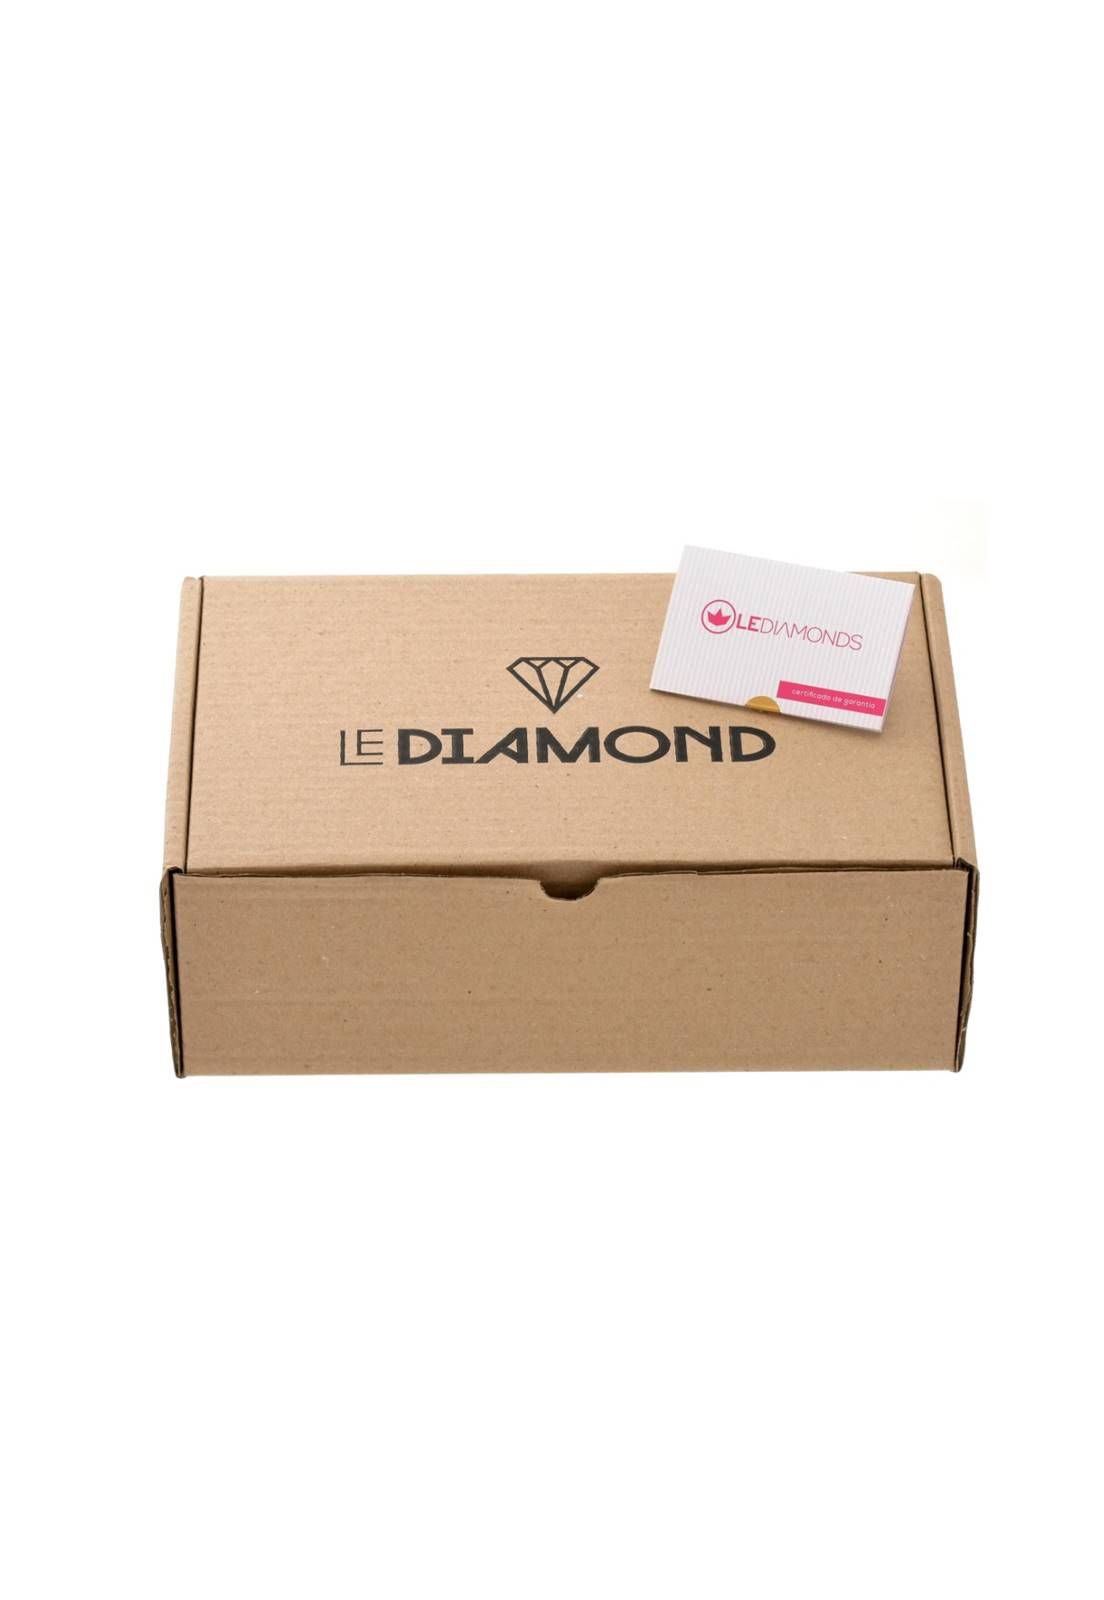 Brinco Argola Le Diamond Forma Geométrica